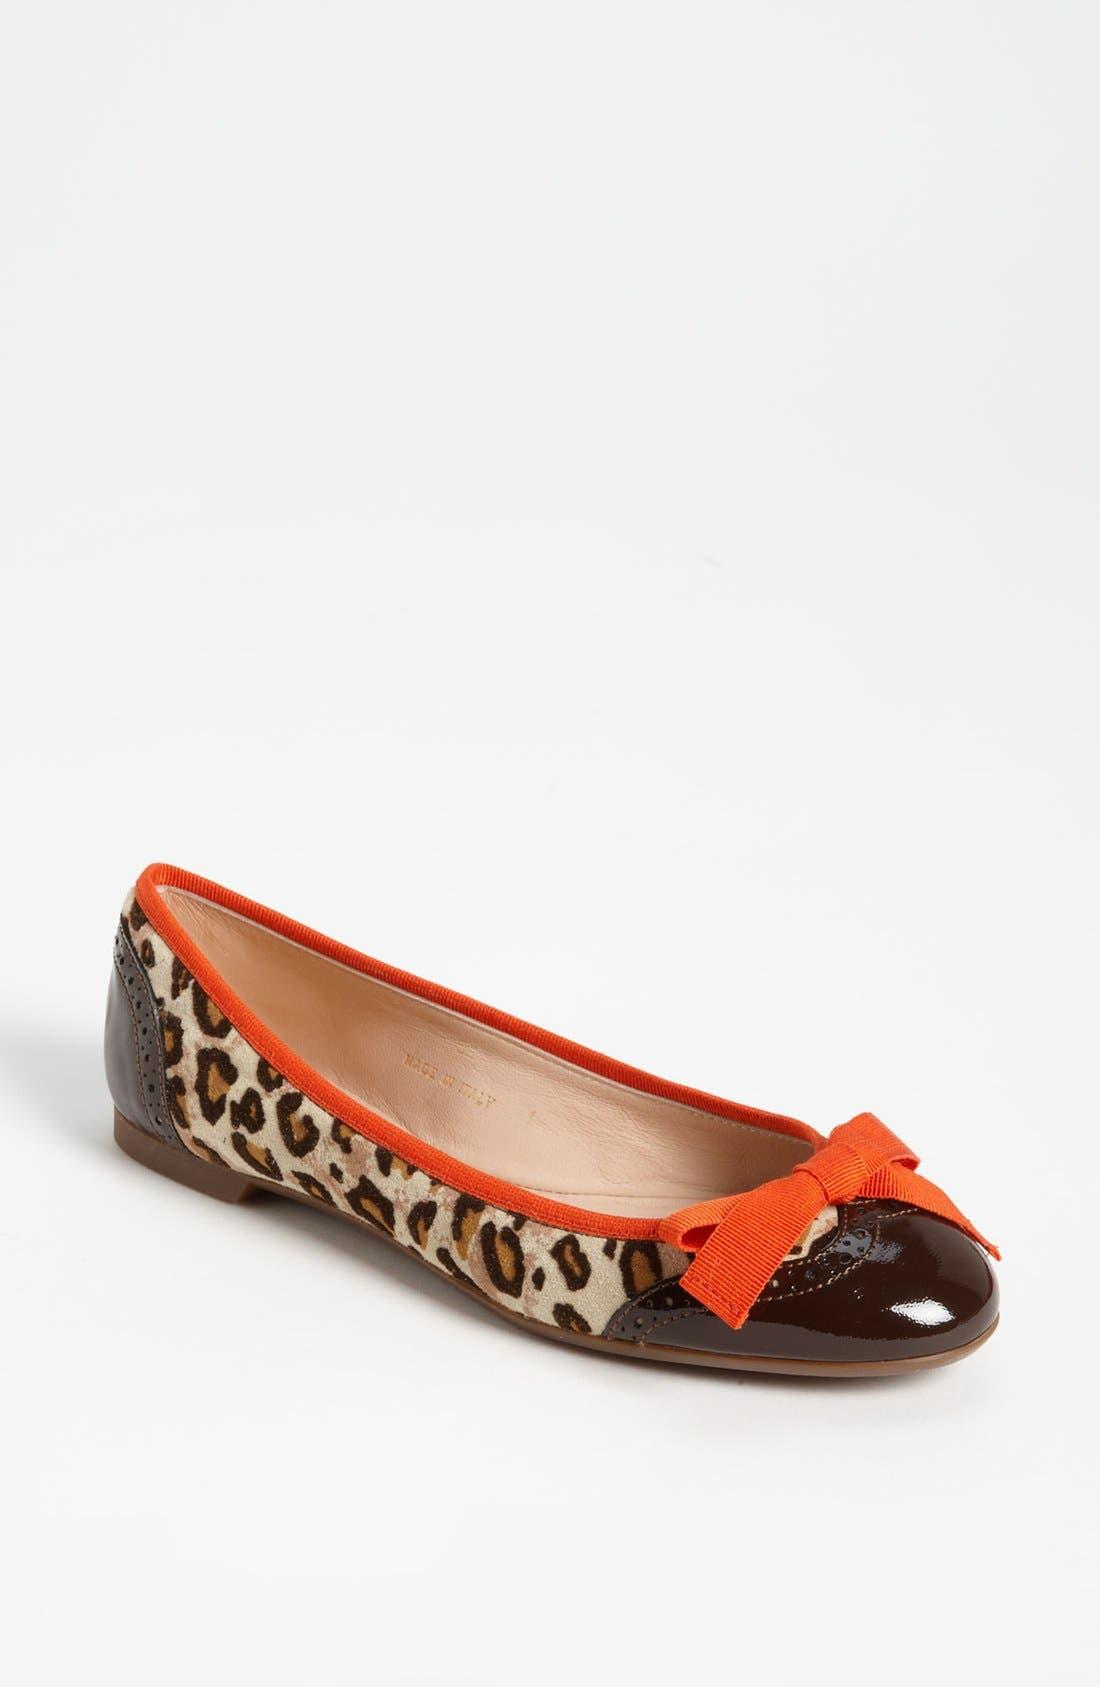 Main Image - Sweet Ballerina 'Biancospino' Leopard Print Ballet Flat